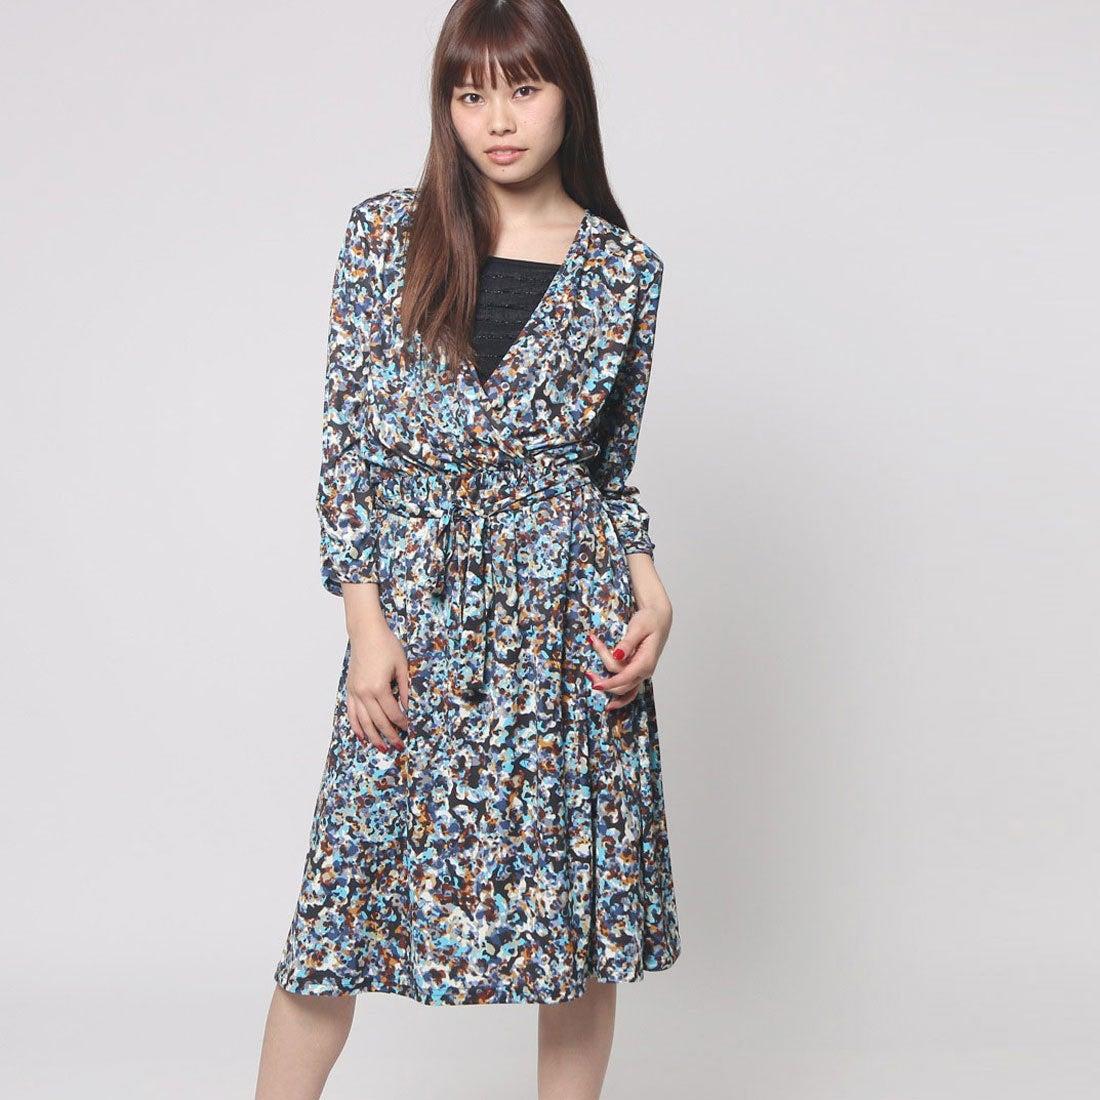 b690de0c460fd FINE (Rename) ファイン FINE カシュクール柄ワンピース (ブルー系)-Rename.jp - 服の新しい売り方